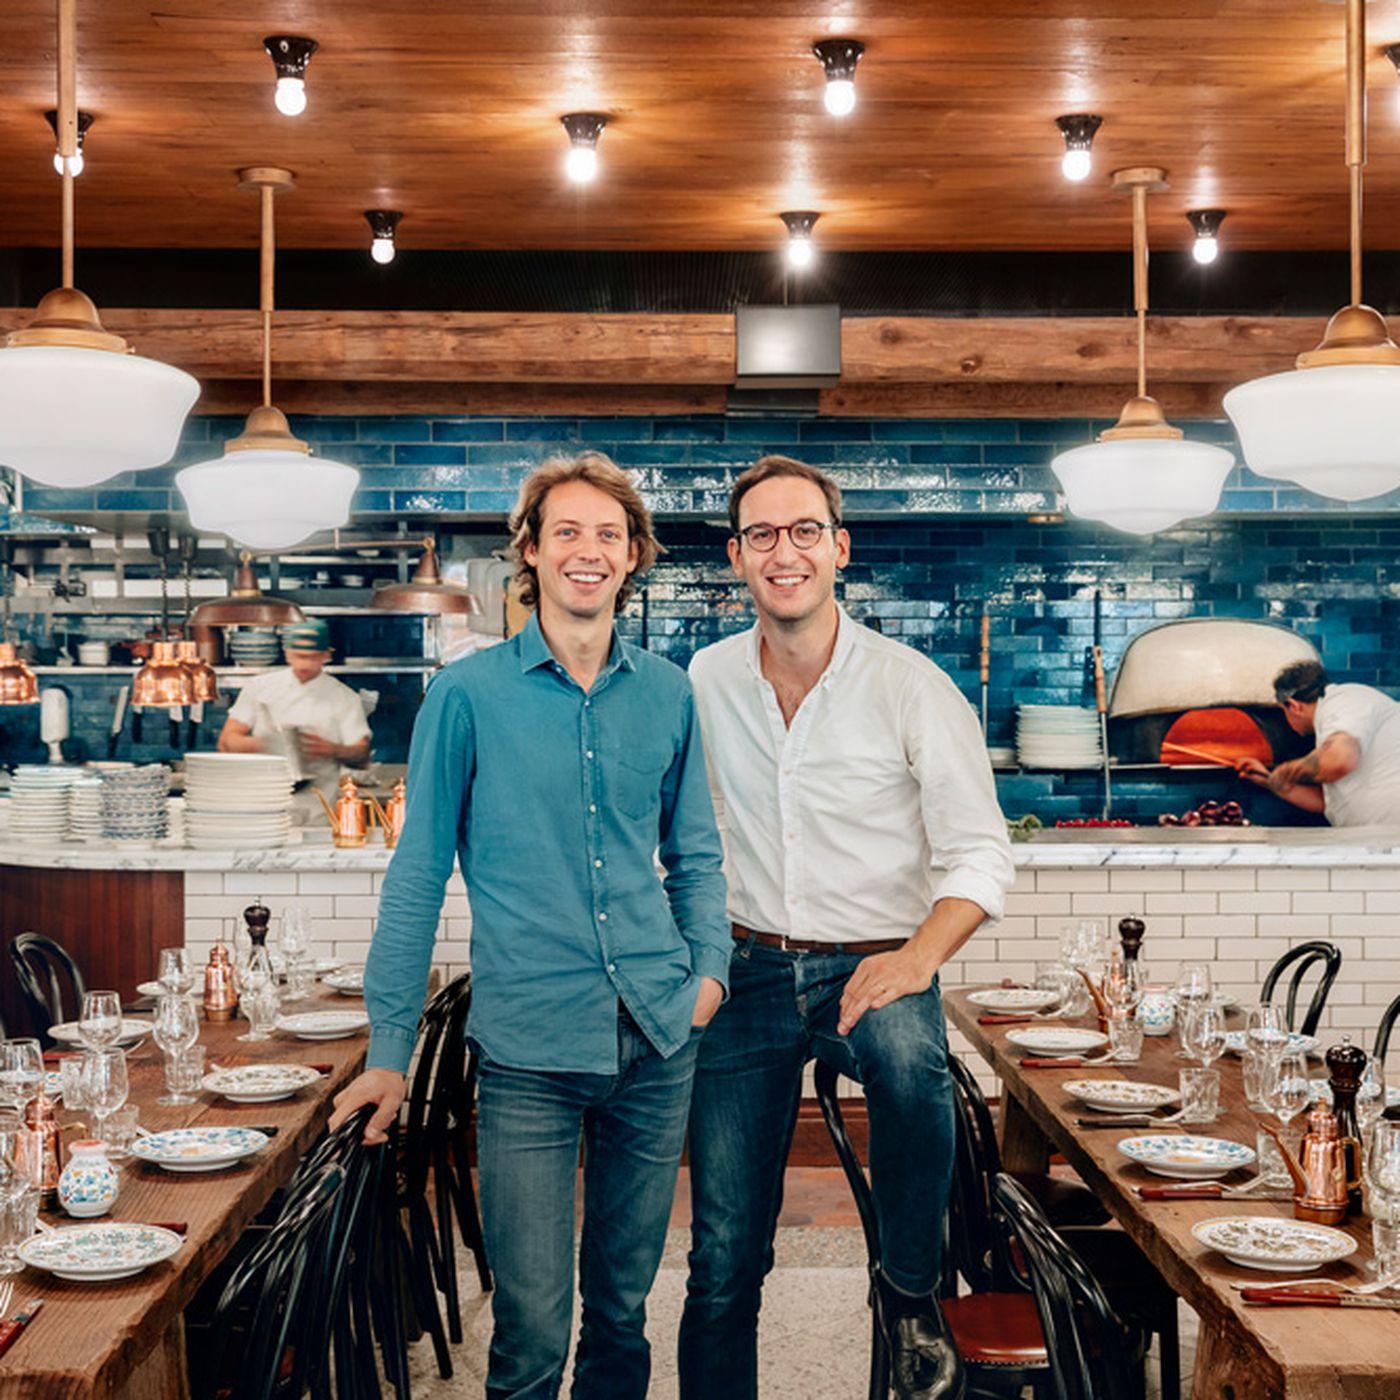 Big Mamma Paris Italian Restaurant Group Plans New Shoreditch Restaurant -  Eater London